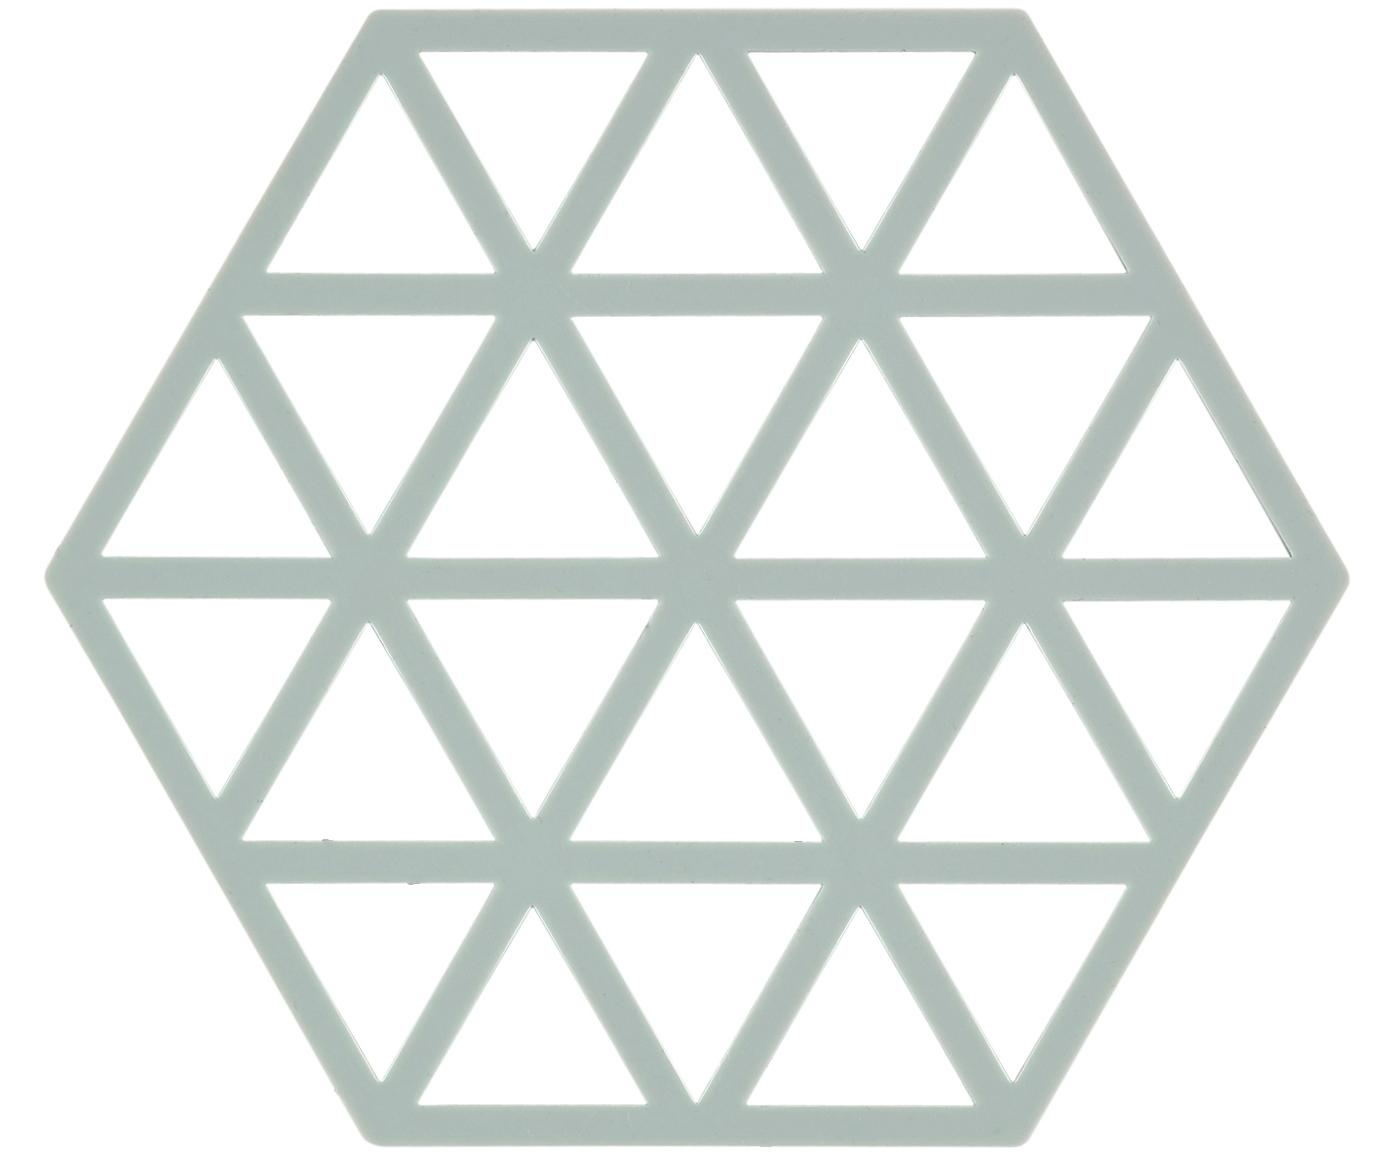 Silikon Topfuntersetzer Triangle, 2 Stück, Silikon, Pastellblau, B 14 x T 16 cm